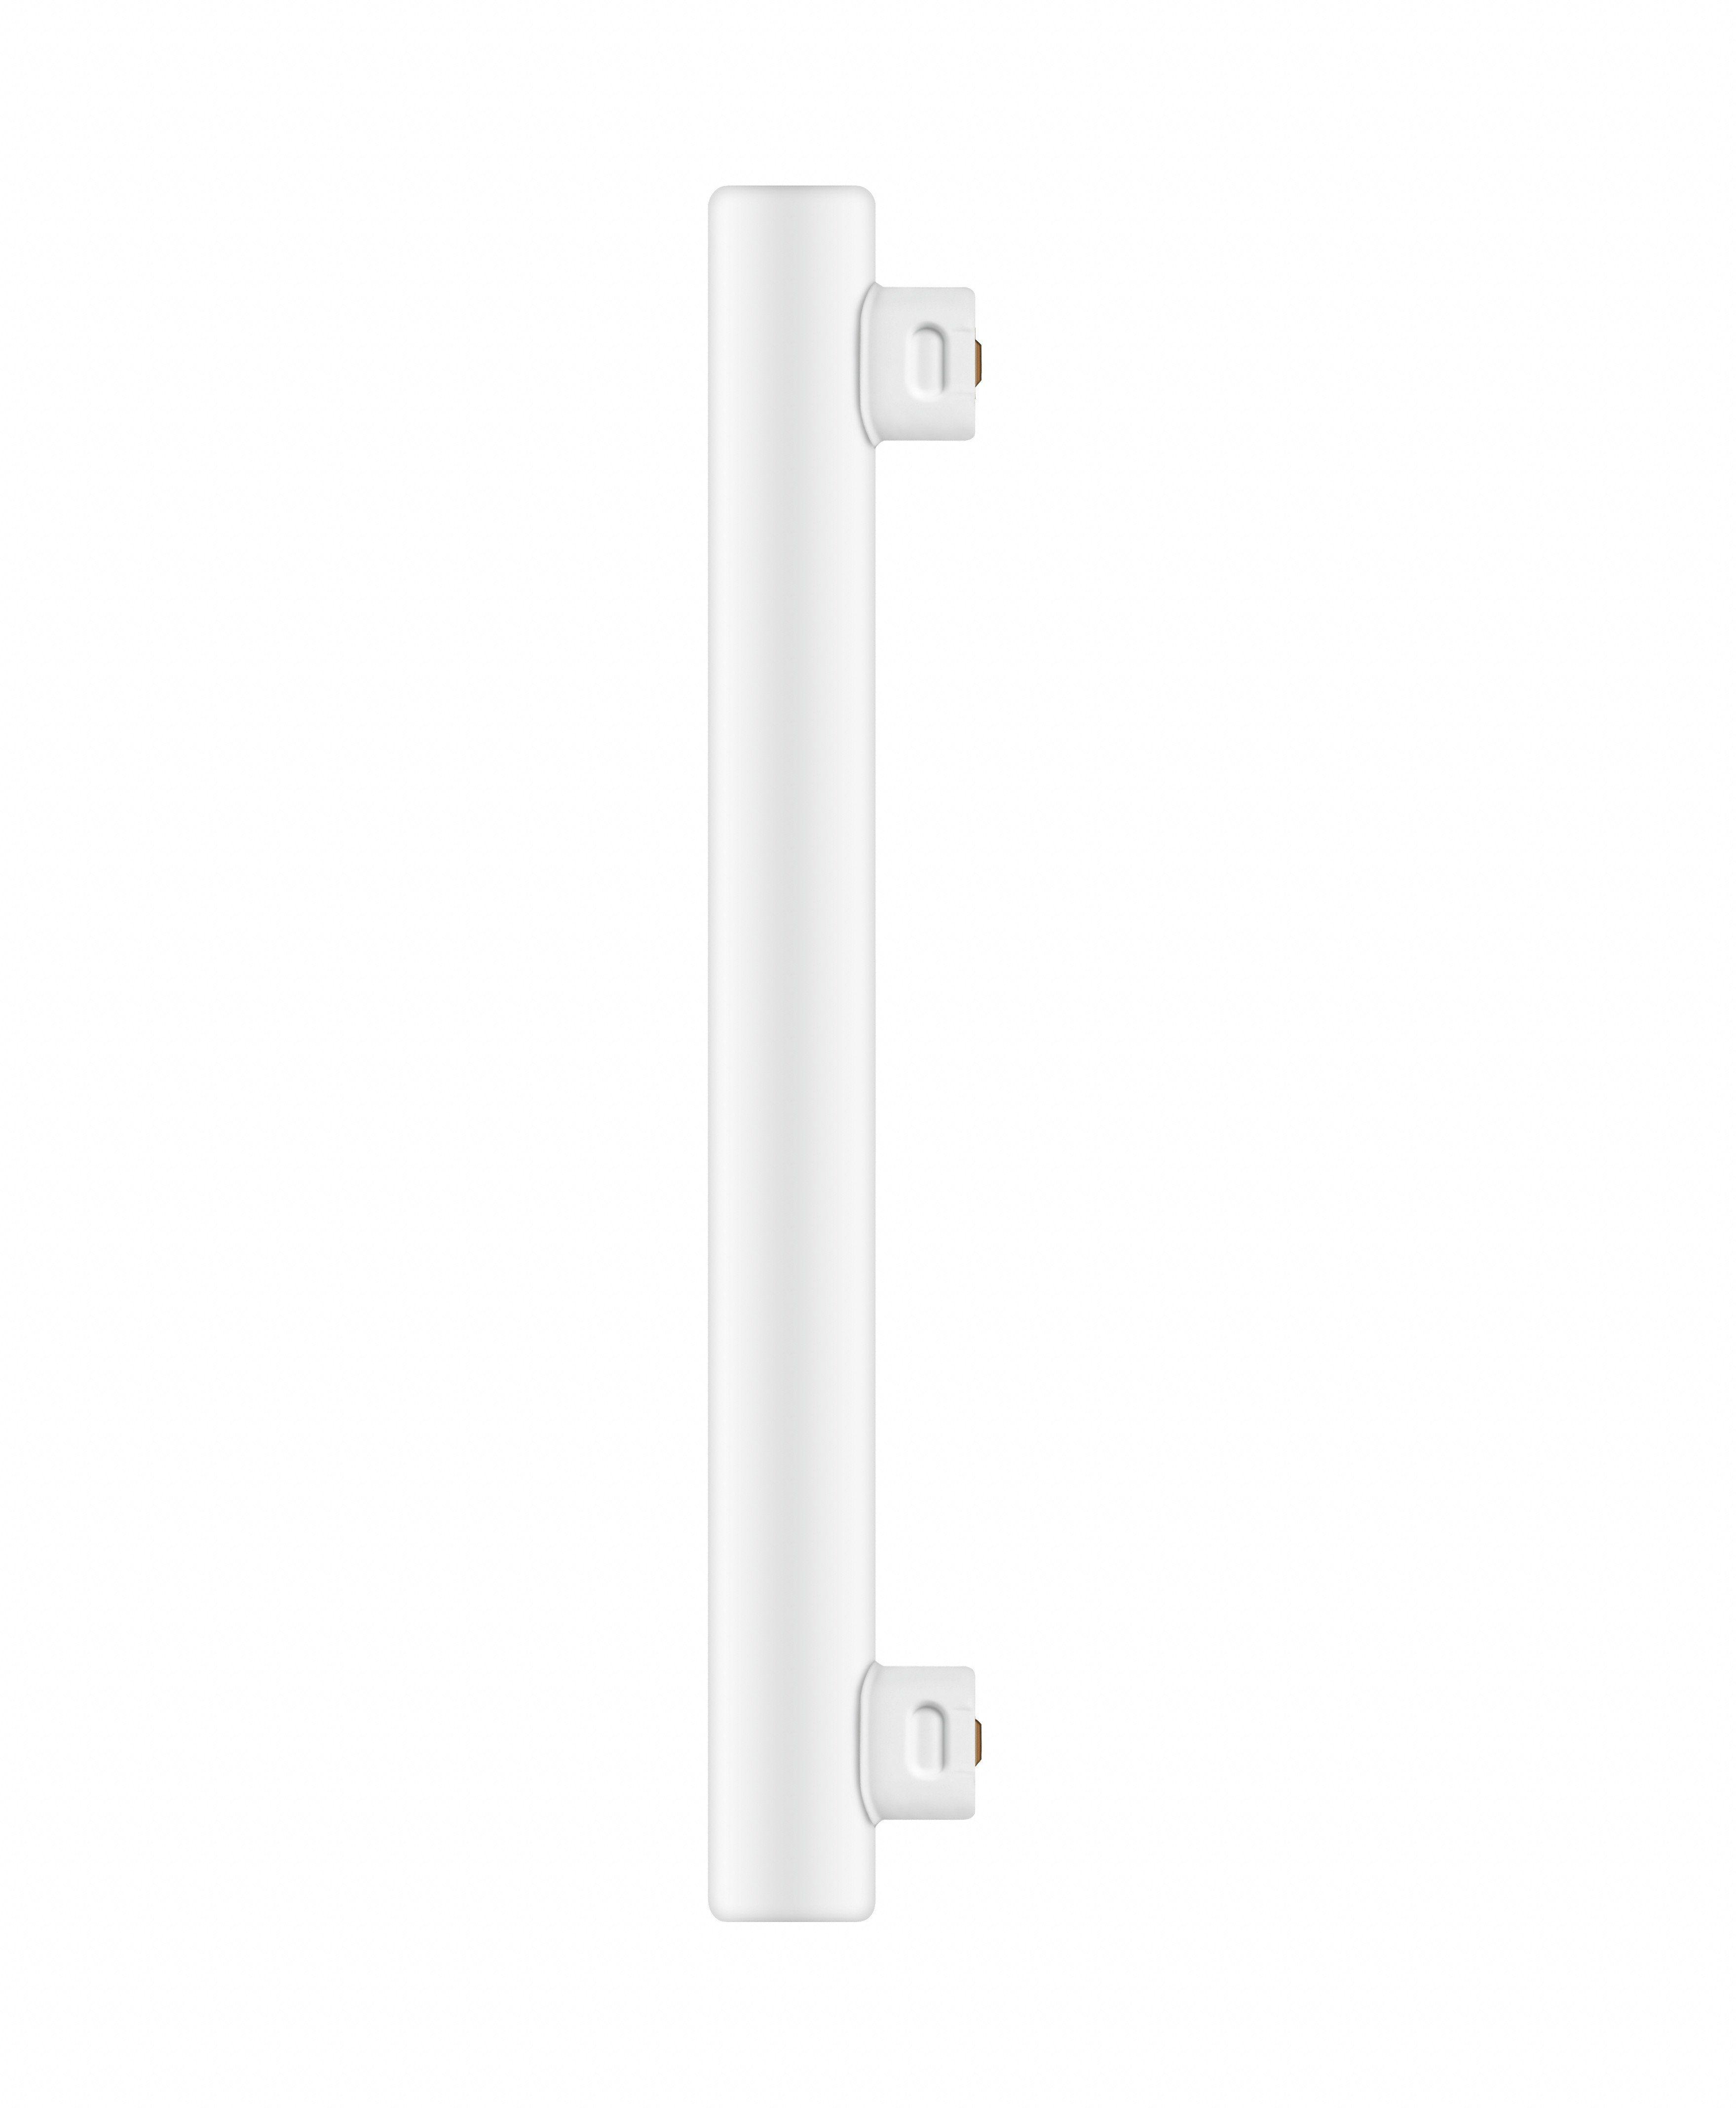 Osram Dimmbare stabförmige LED-Lampe »LEDinestra advanced 4.5 W/827 300 mm S14d«